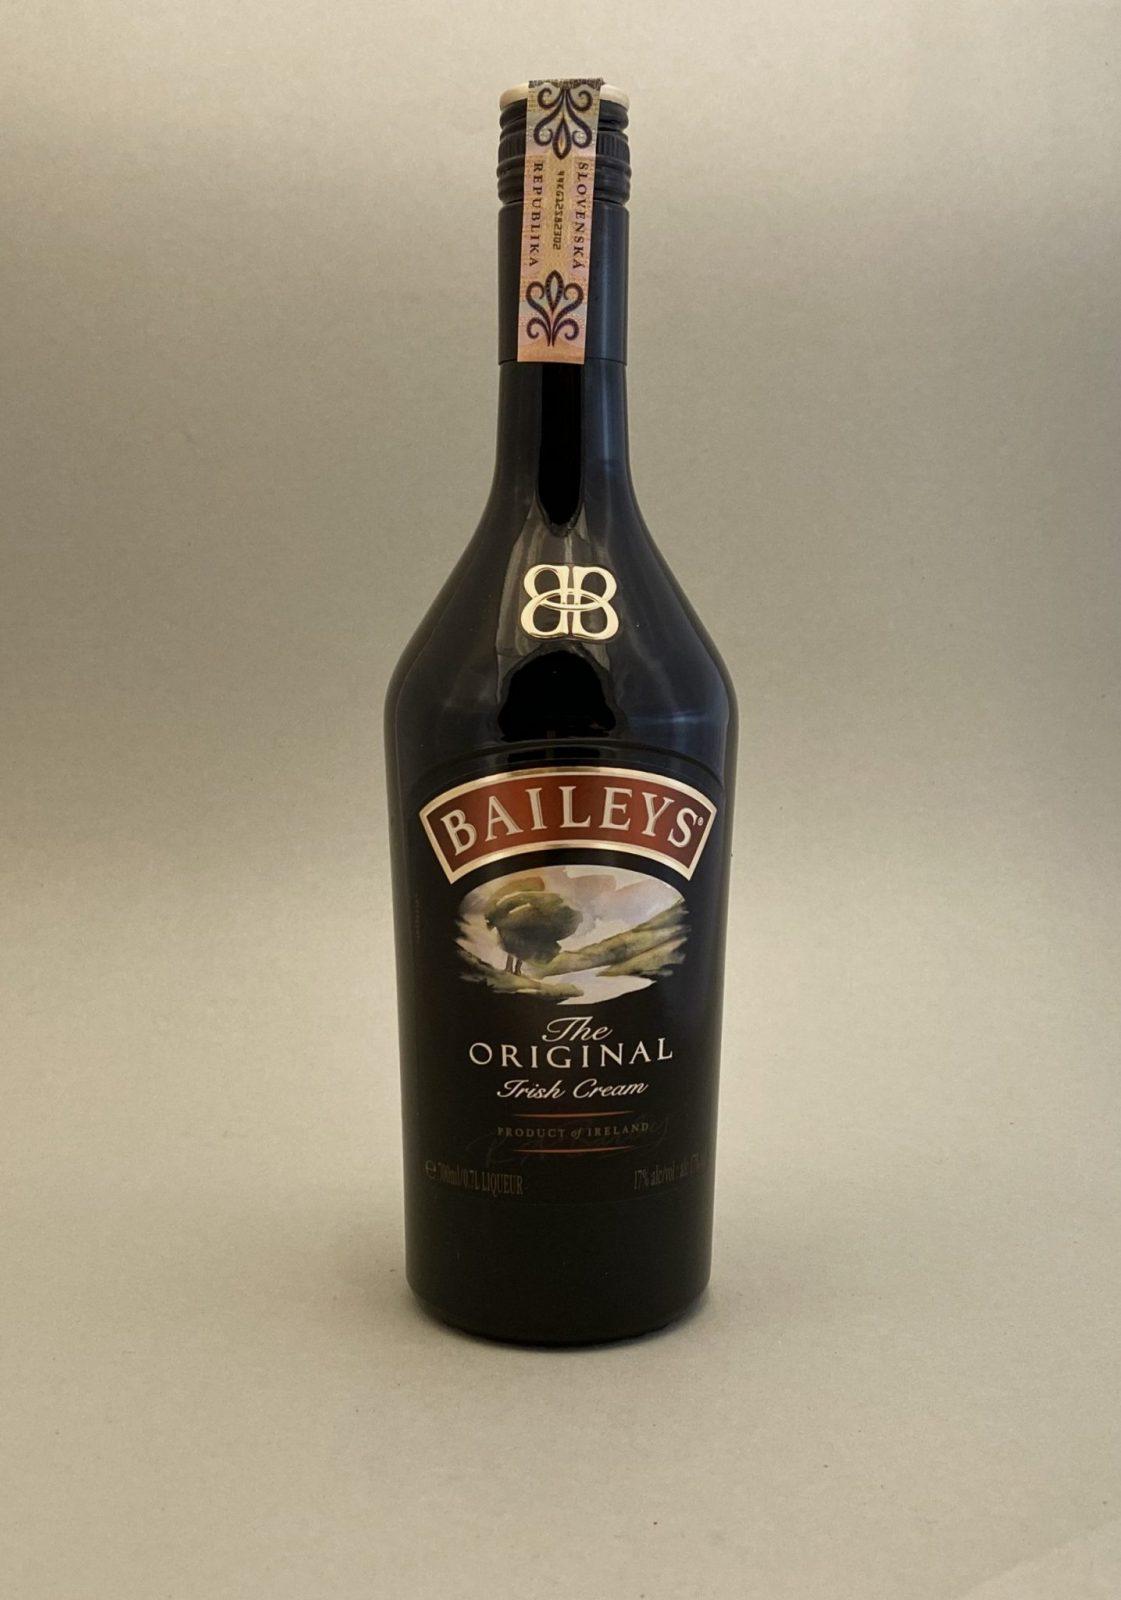 Baileys 17%, Bottleshop Sunny wines slnecnice mesto, petrzalka, likér, rozvoz alkoholu, eshop